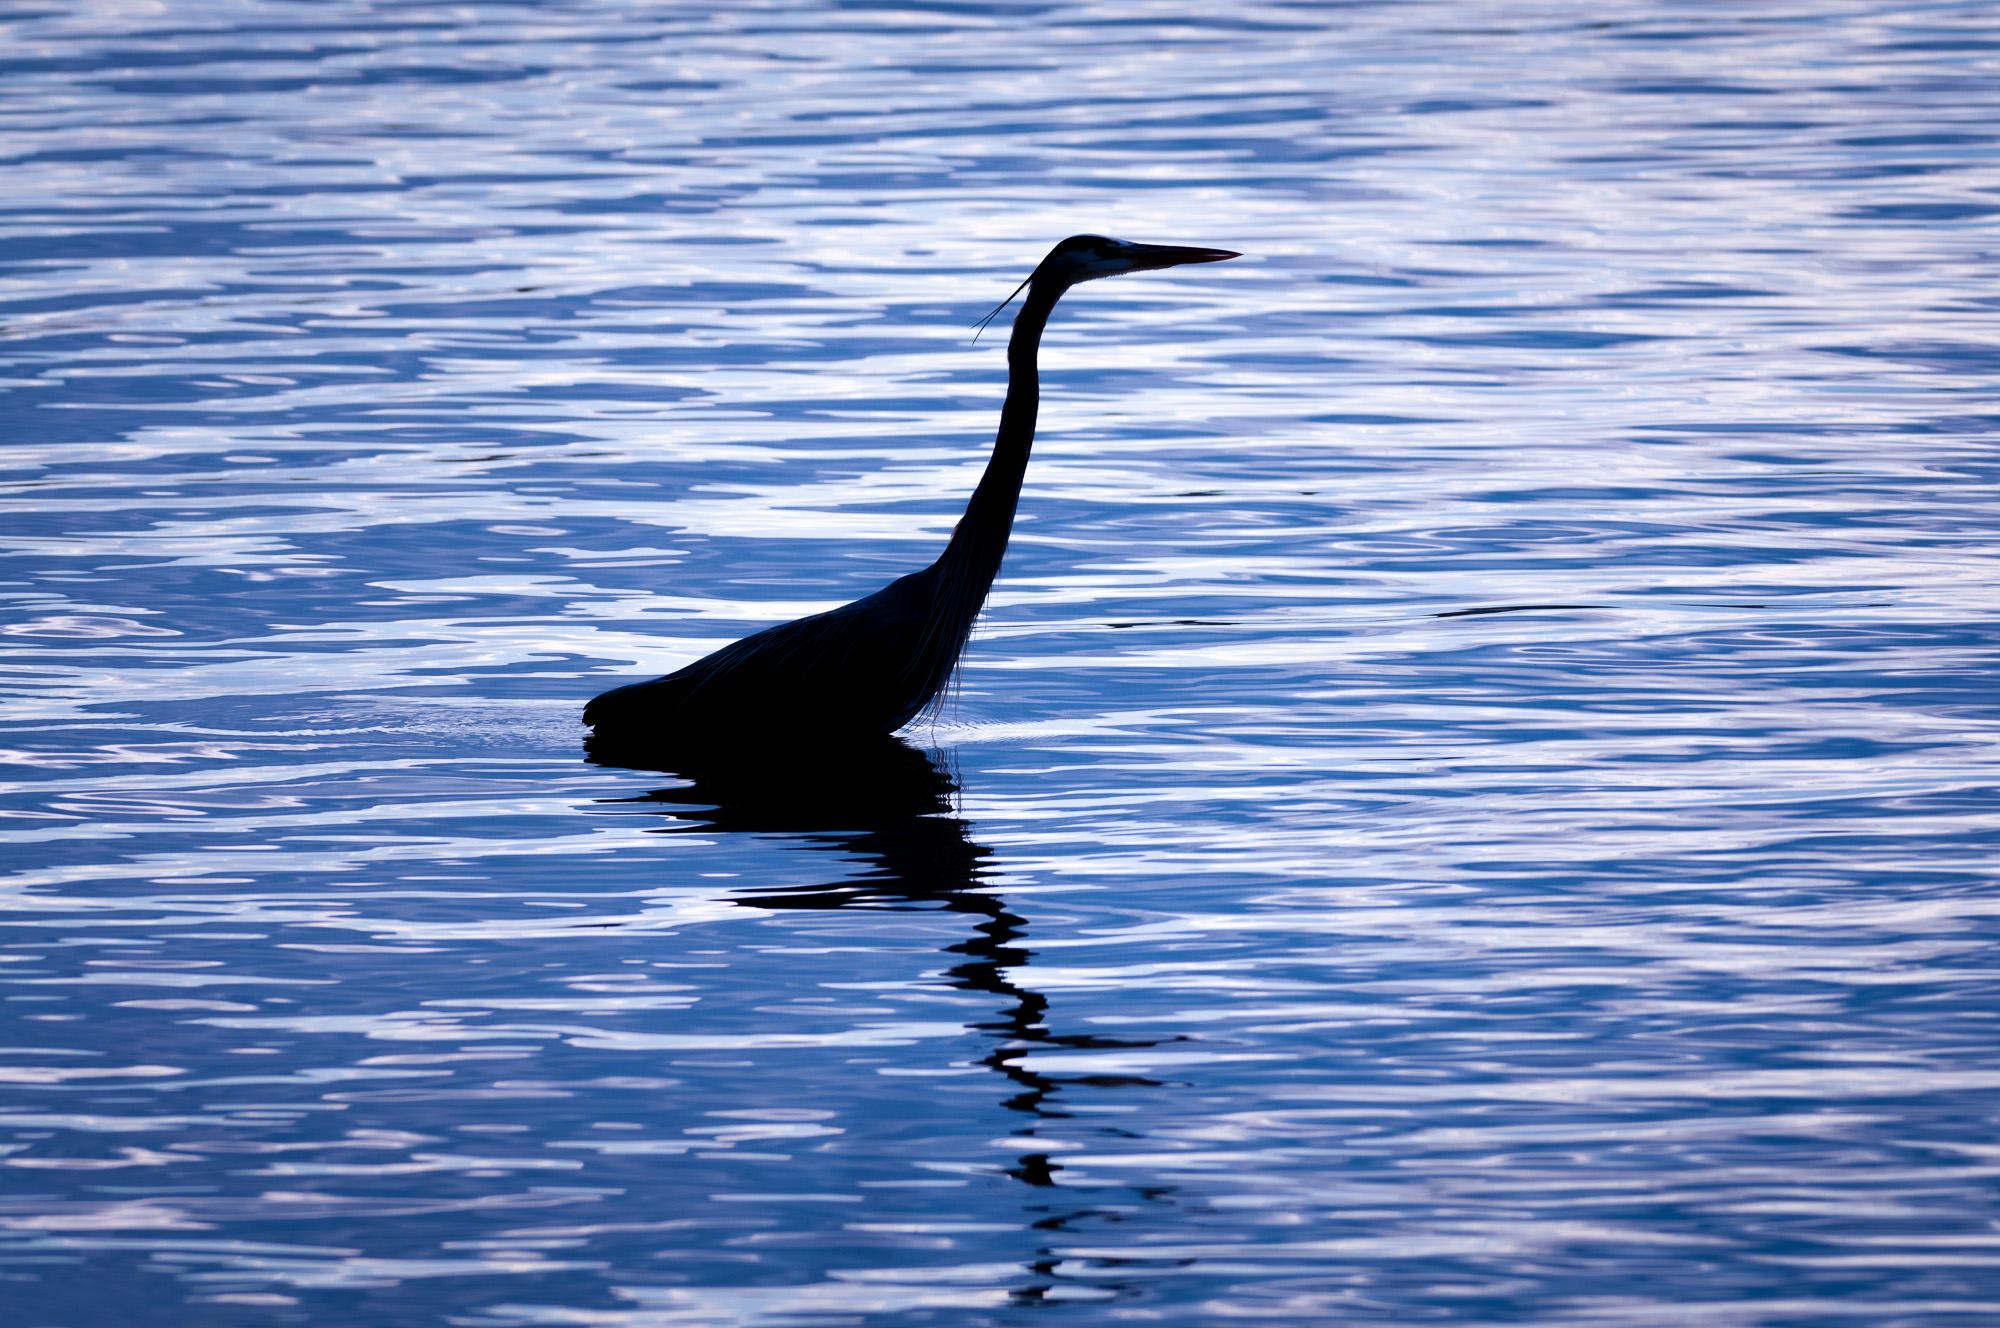 Great Blue Heron in Silhouette